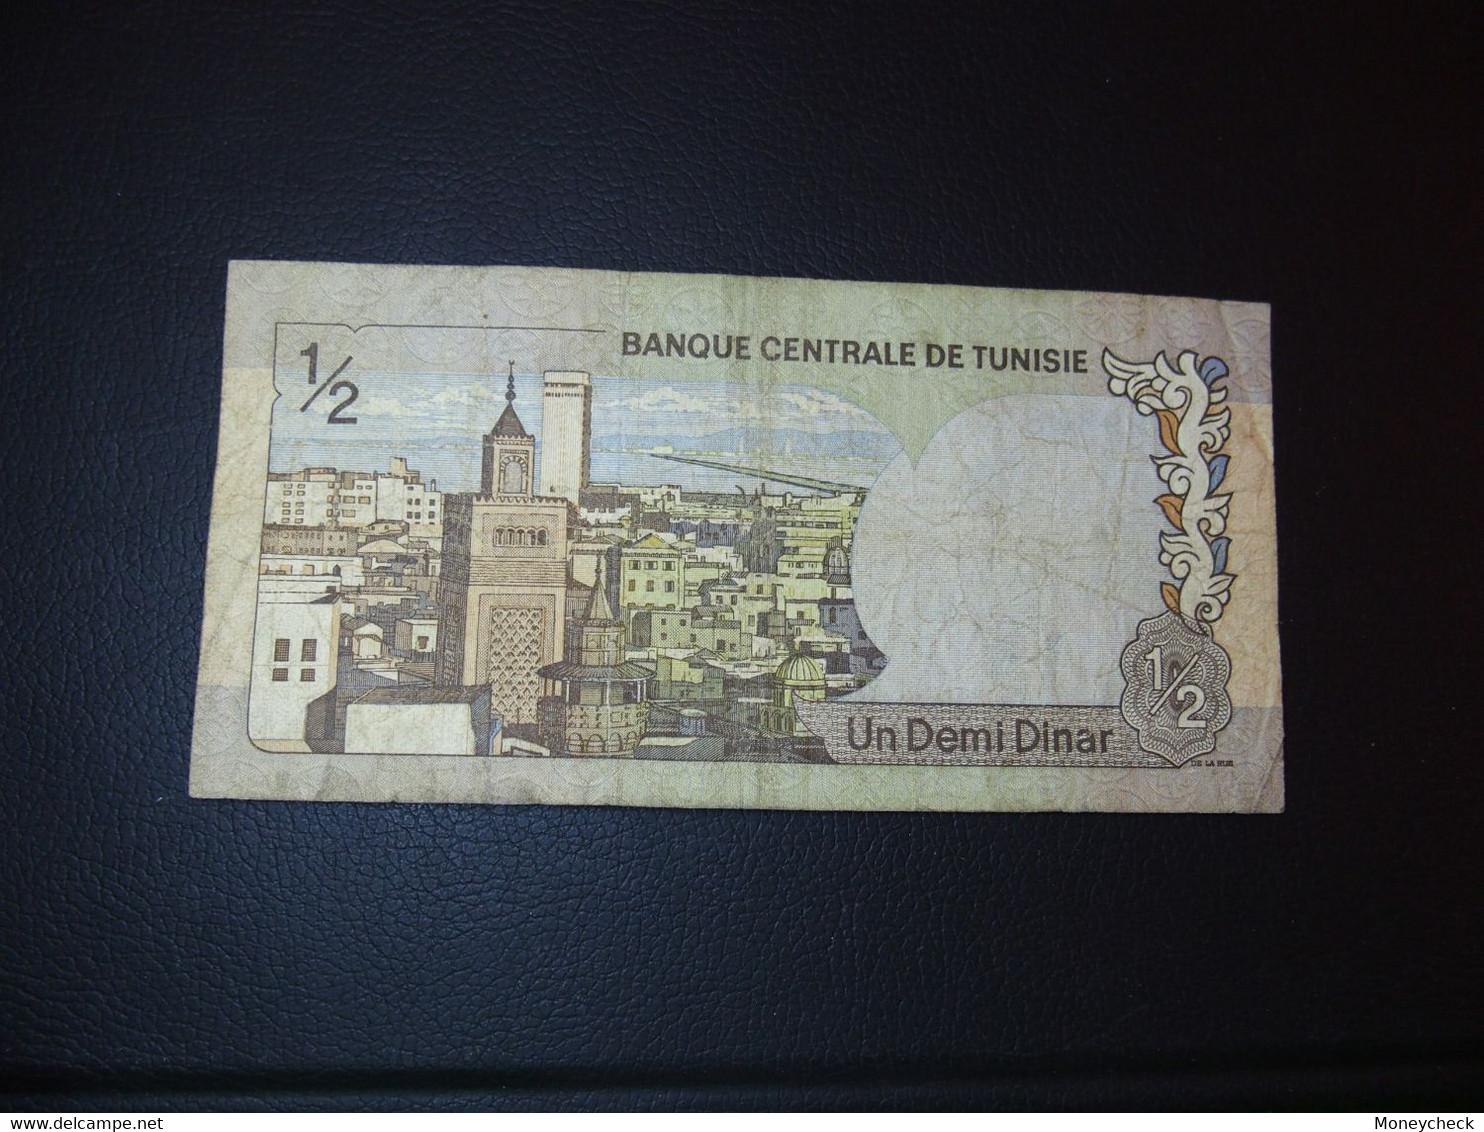 1/2 Dinars Tunisie - Tunesia - Tunisia